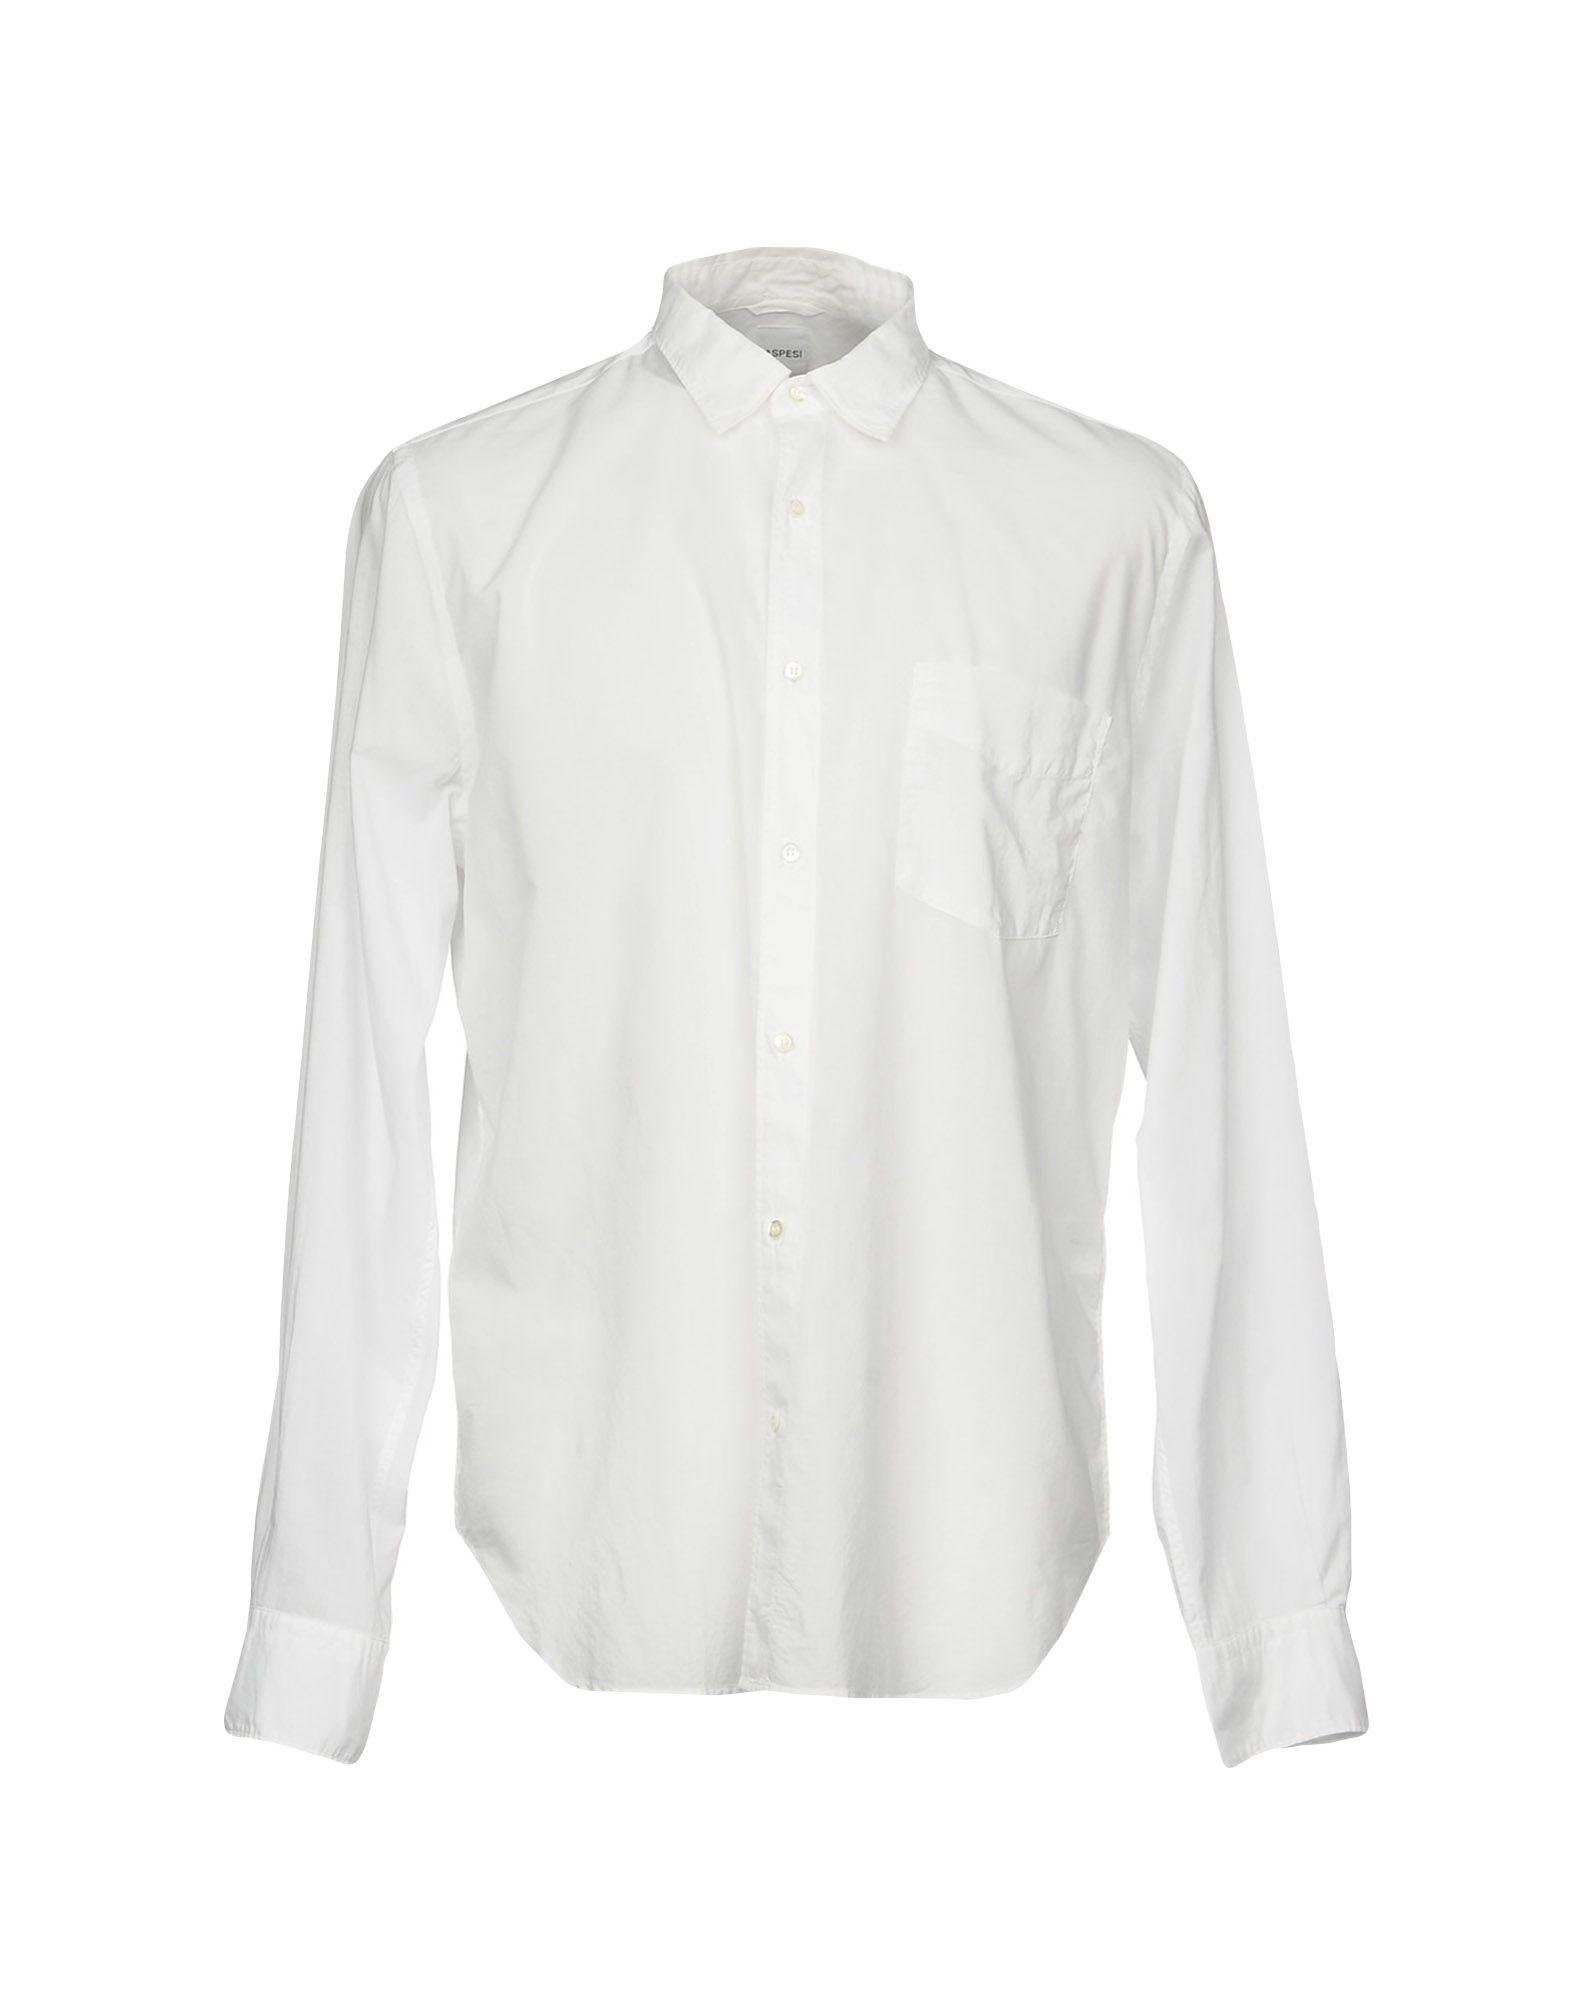 Aspesi Men - shop online parka, down jackets, shirt jackets and more at  YOOX United States